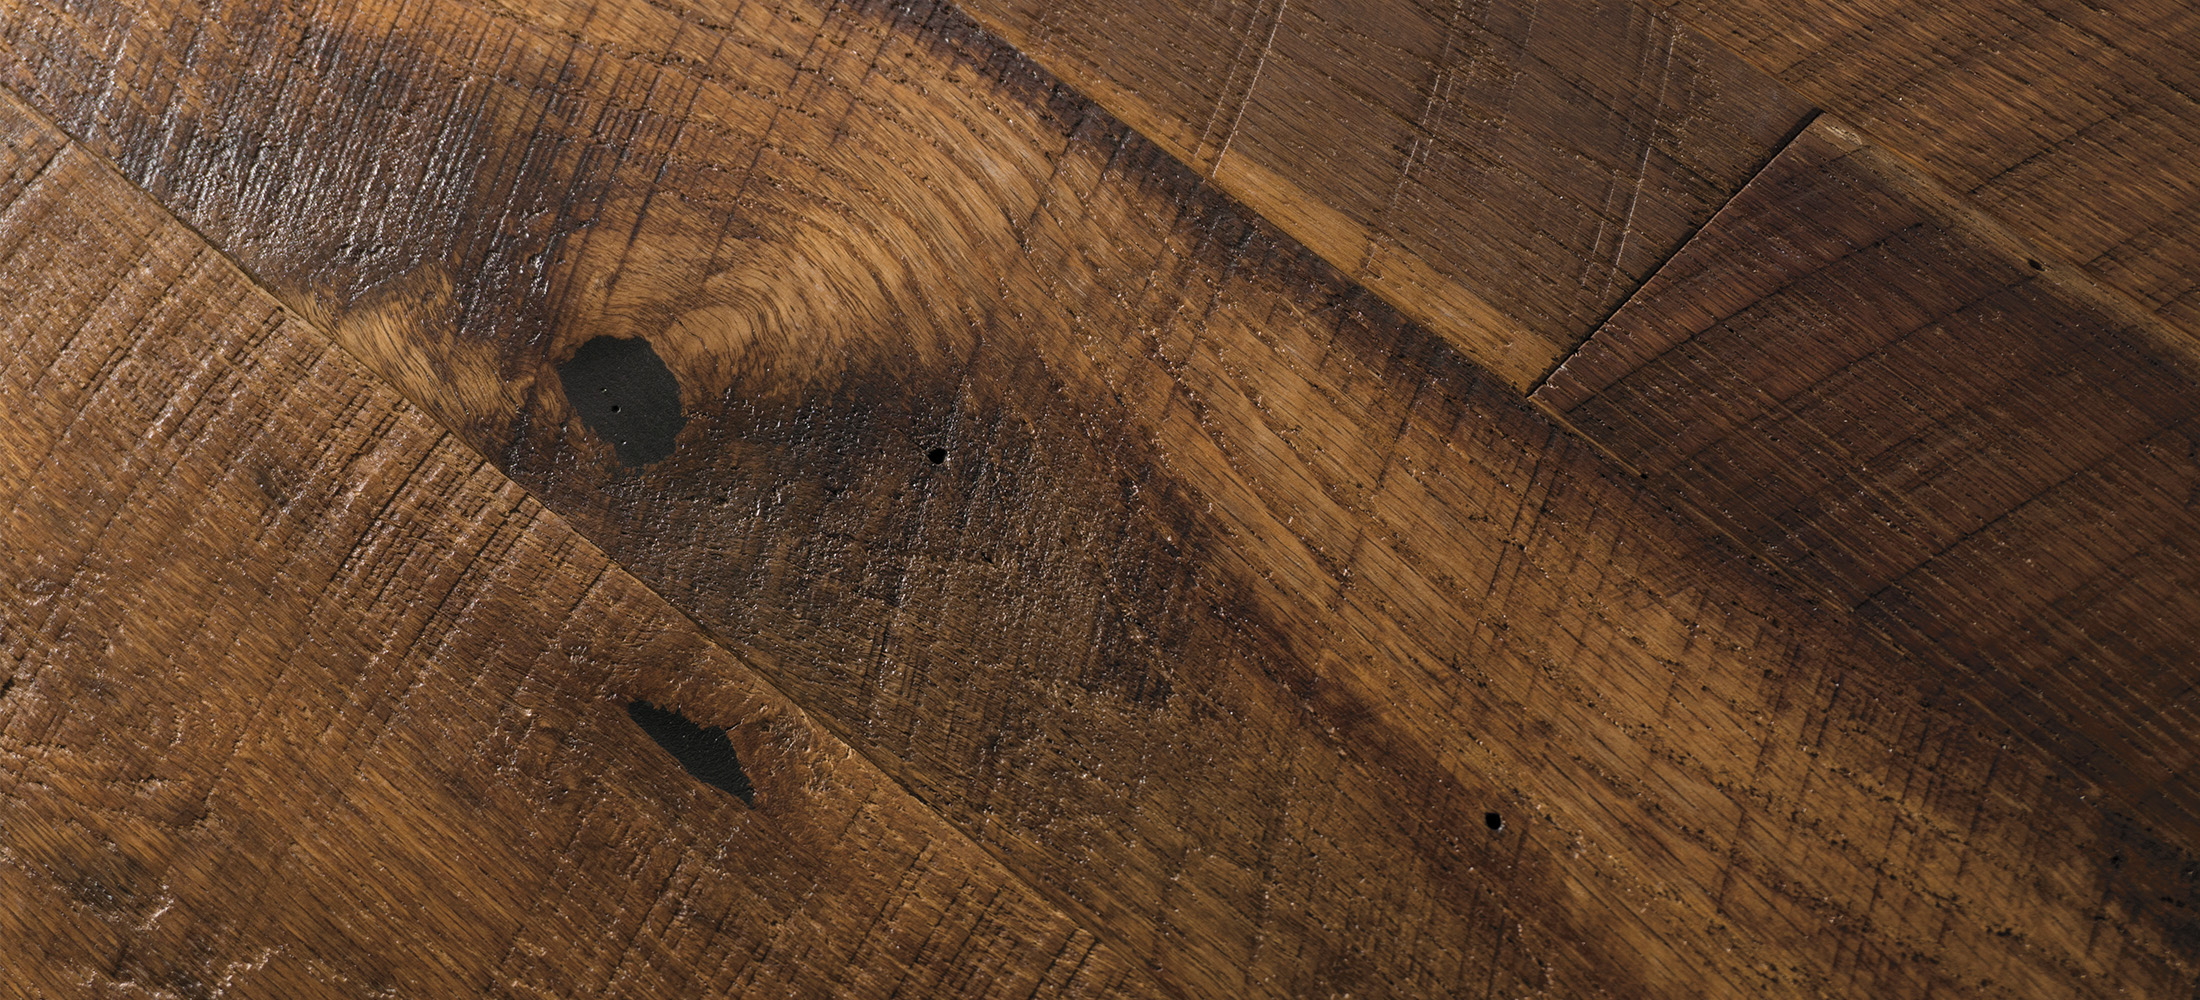 Reclaimed Oak Original Surface Wide Plank Flooring Texture